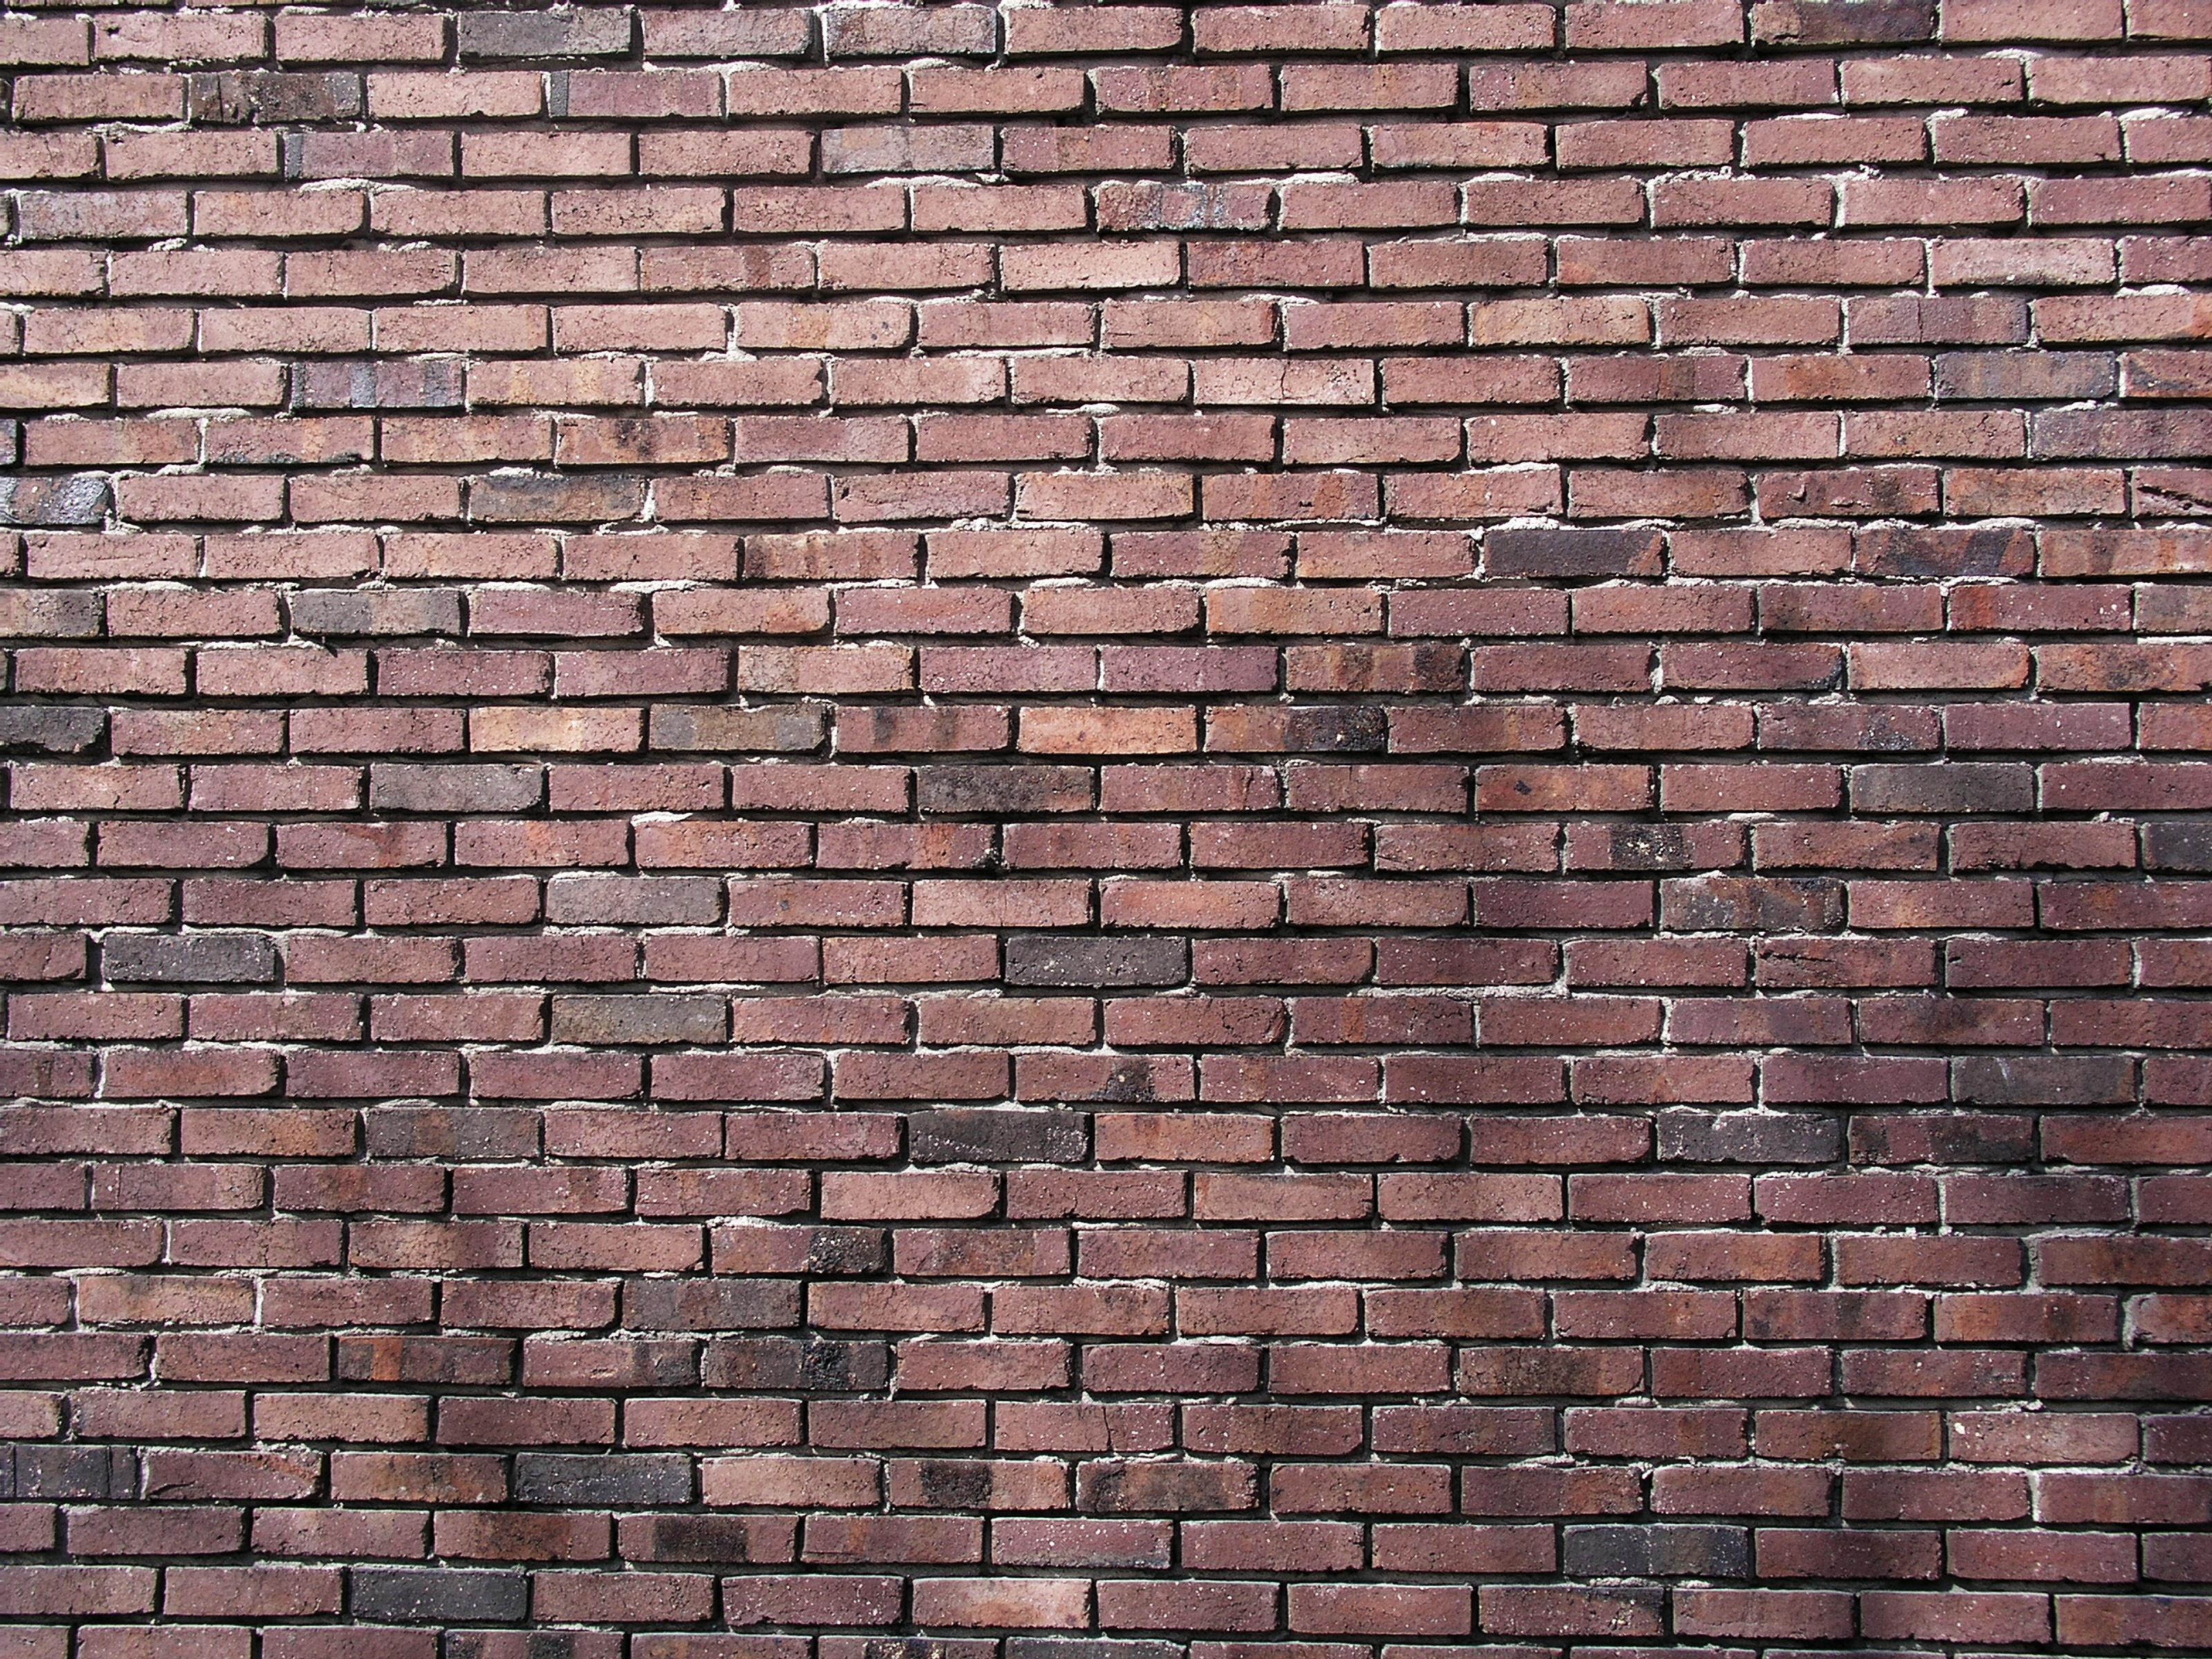 File:Soderledskyrkan brick wall.jpg - Wikimedia Commons